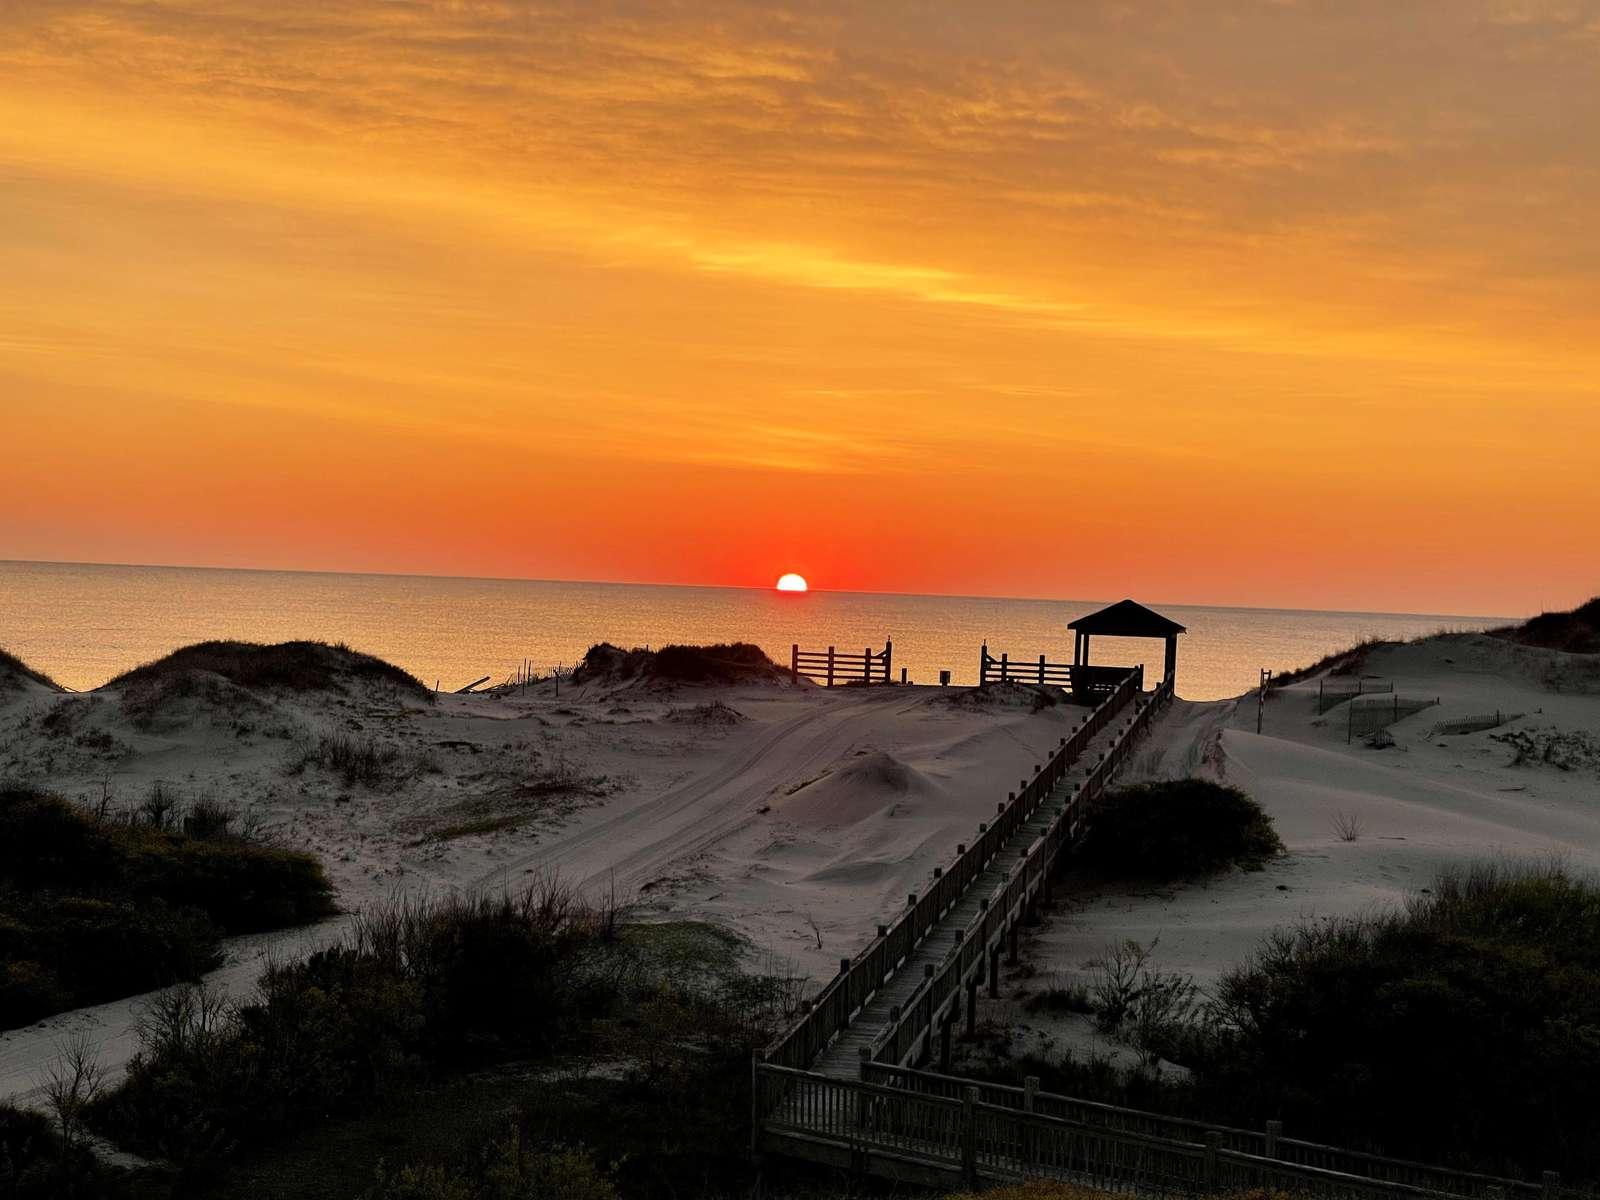 Sunset view at Mark Twain - property